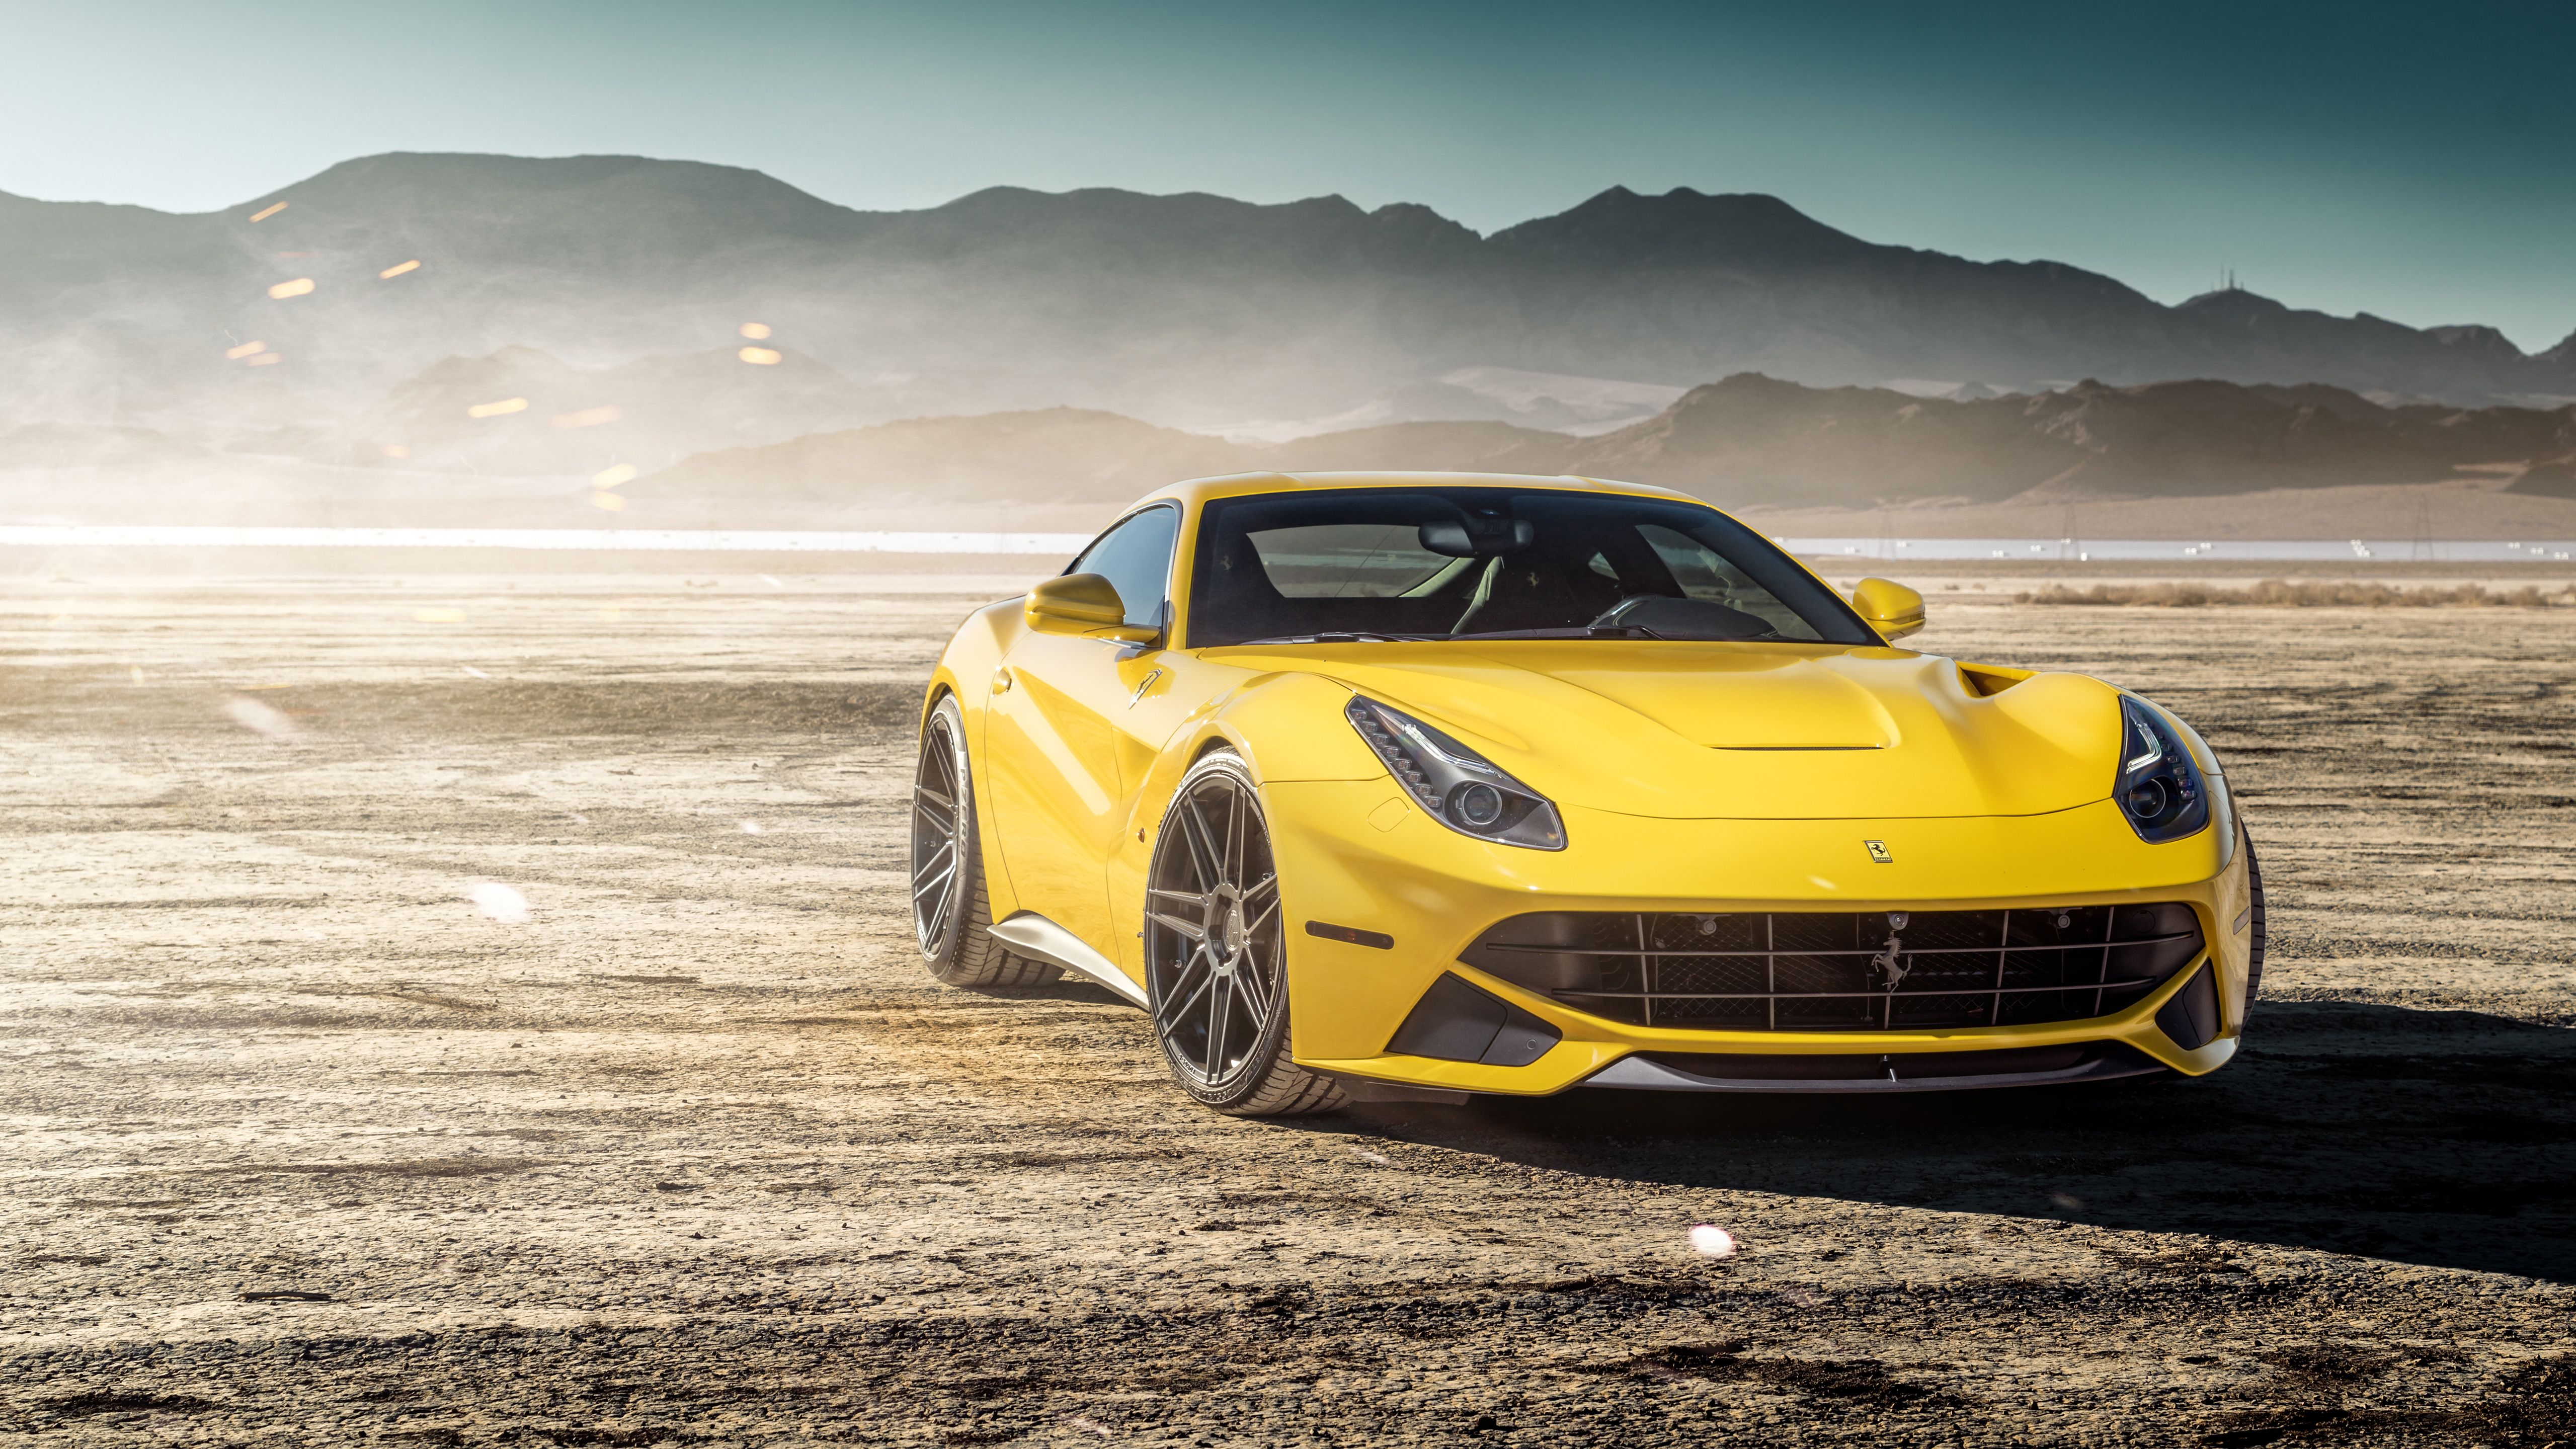 Yellow Ferrari Wallpapers Top Free Yellow Ferrari Backgrounds Wallpaperaccess